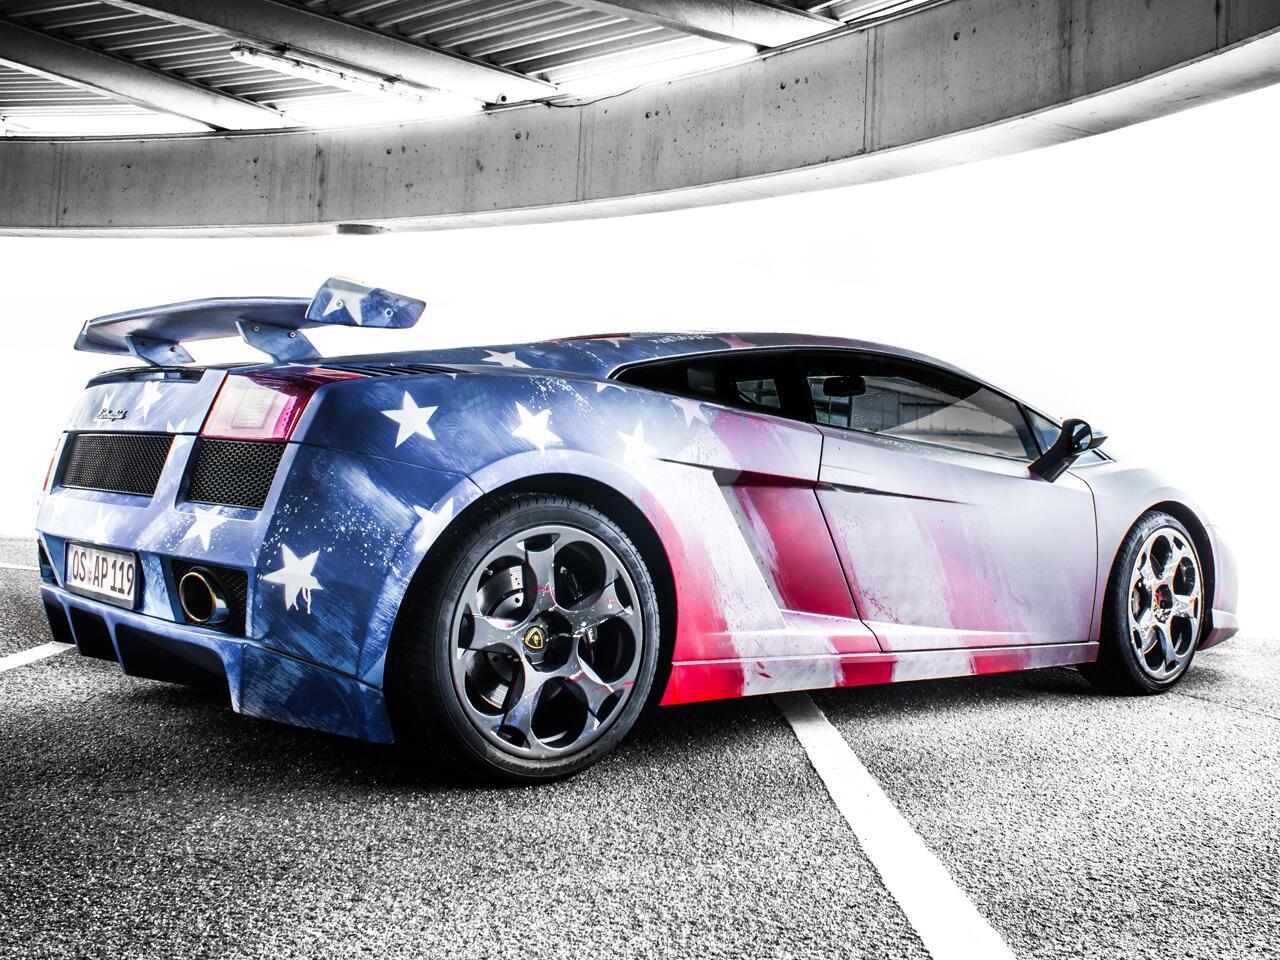 Bild zu Streetart mal anders: Abgefahrene Graffiti-Kunst am Auto von René Turrek